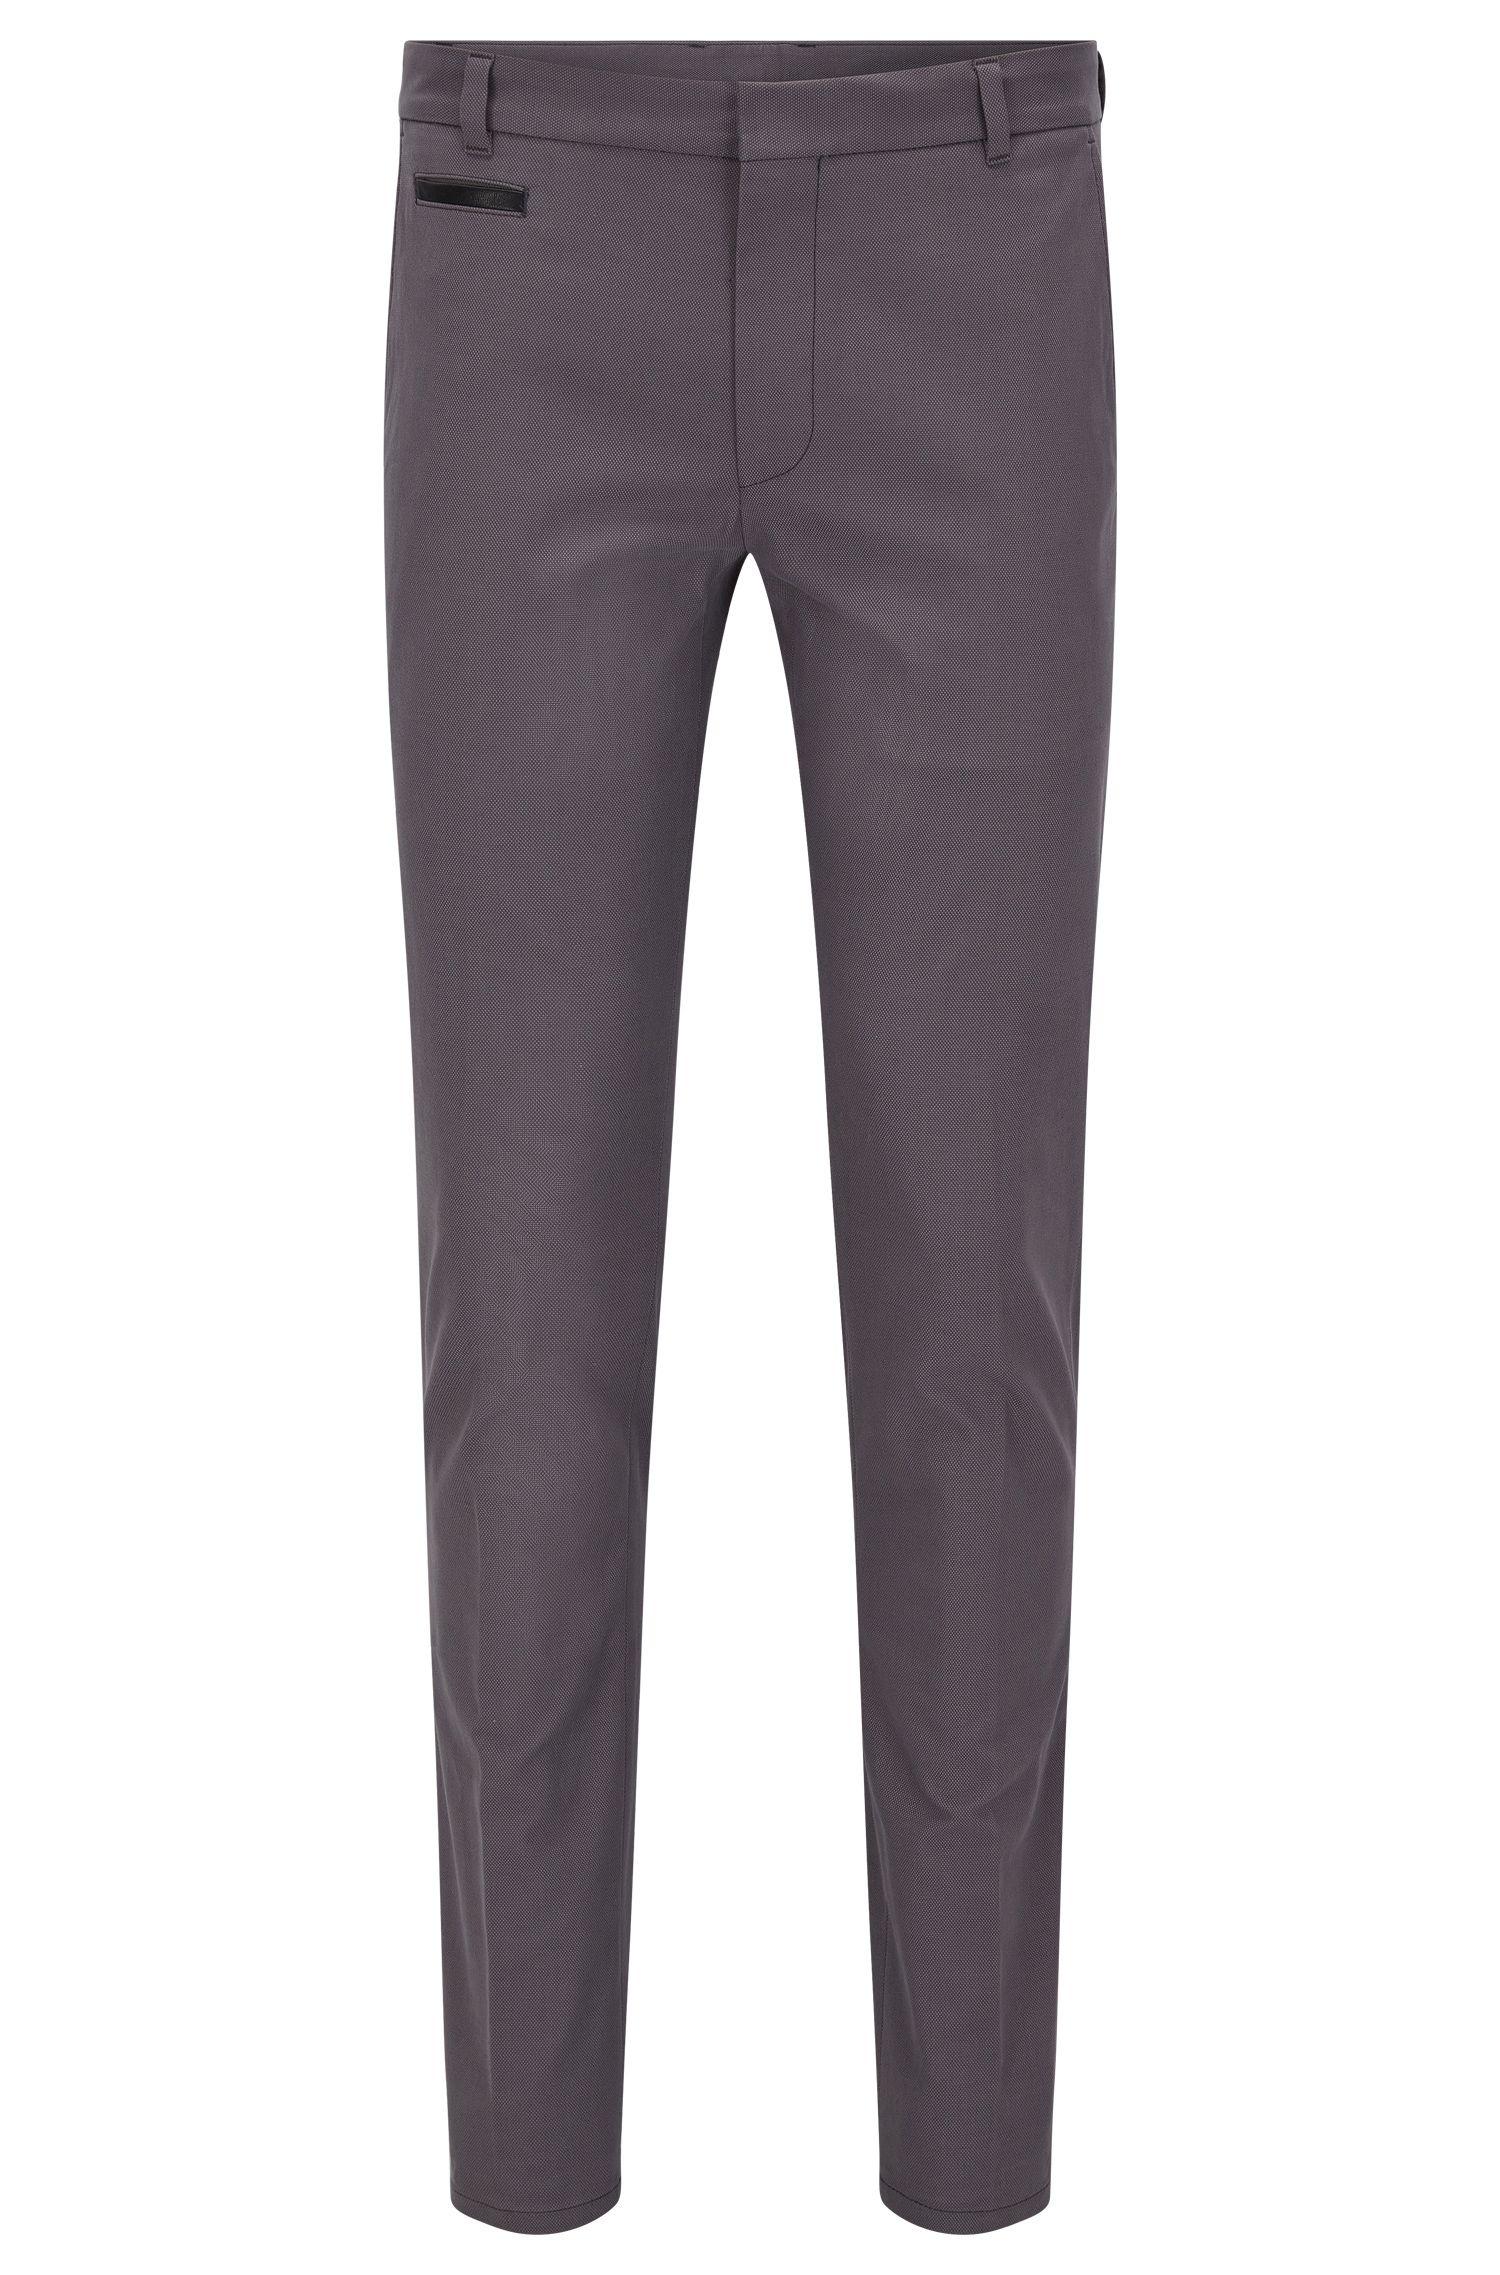 Pantaloni extra slim fit in tessuto a due tonalità